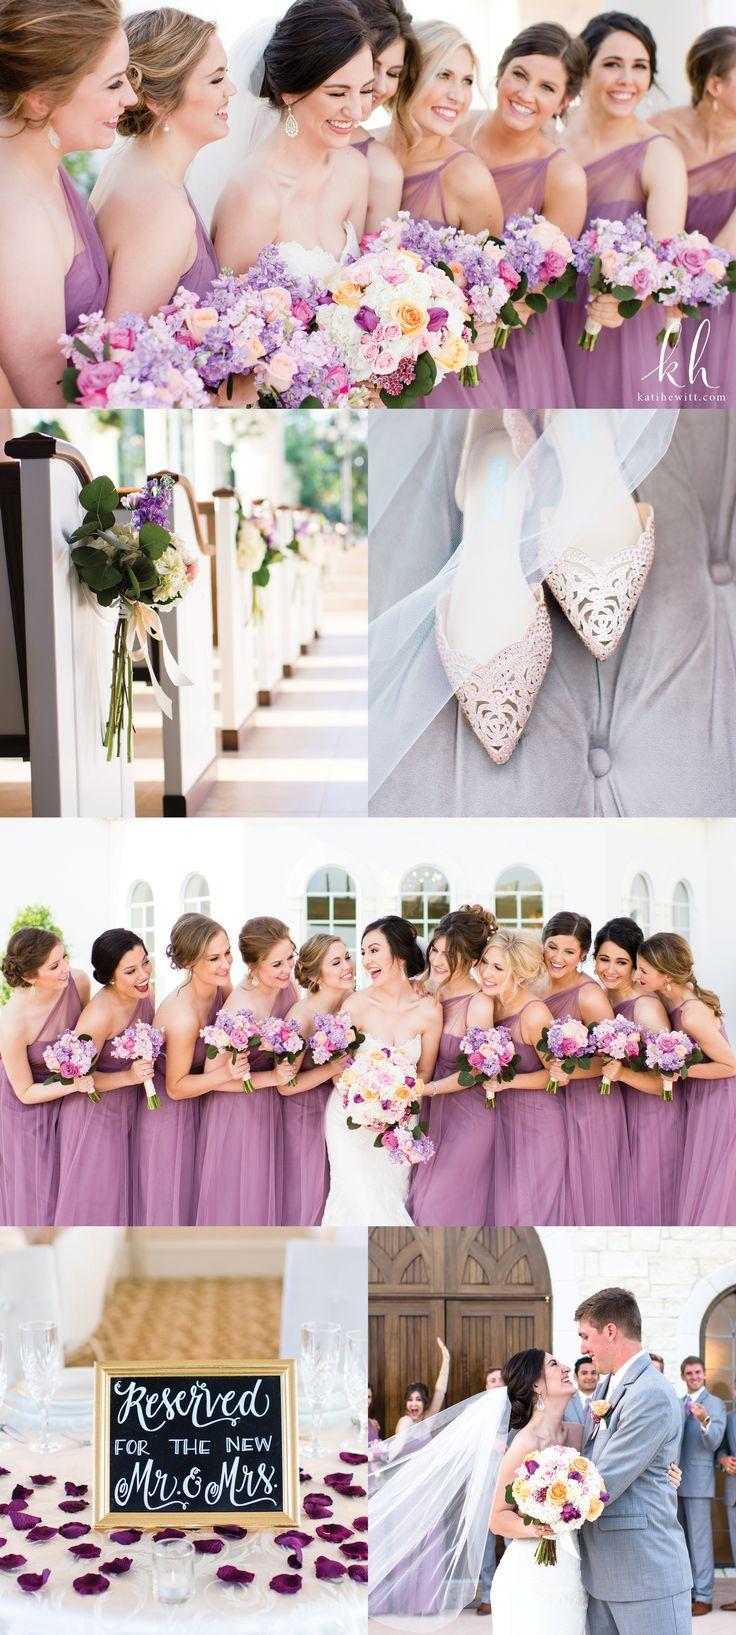 Lavender wedding at Ashton Gardens Houston West by Kati Hewitt Photography